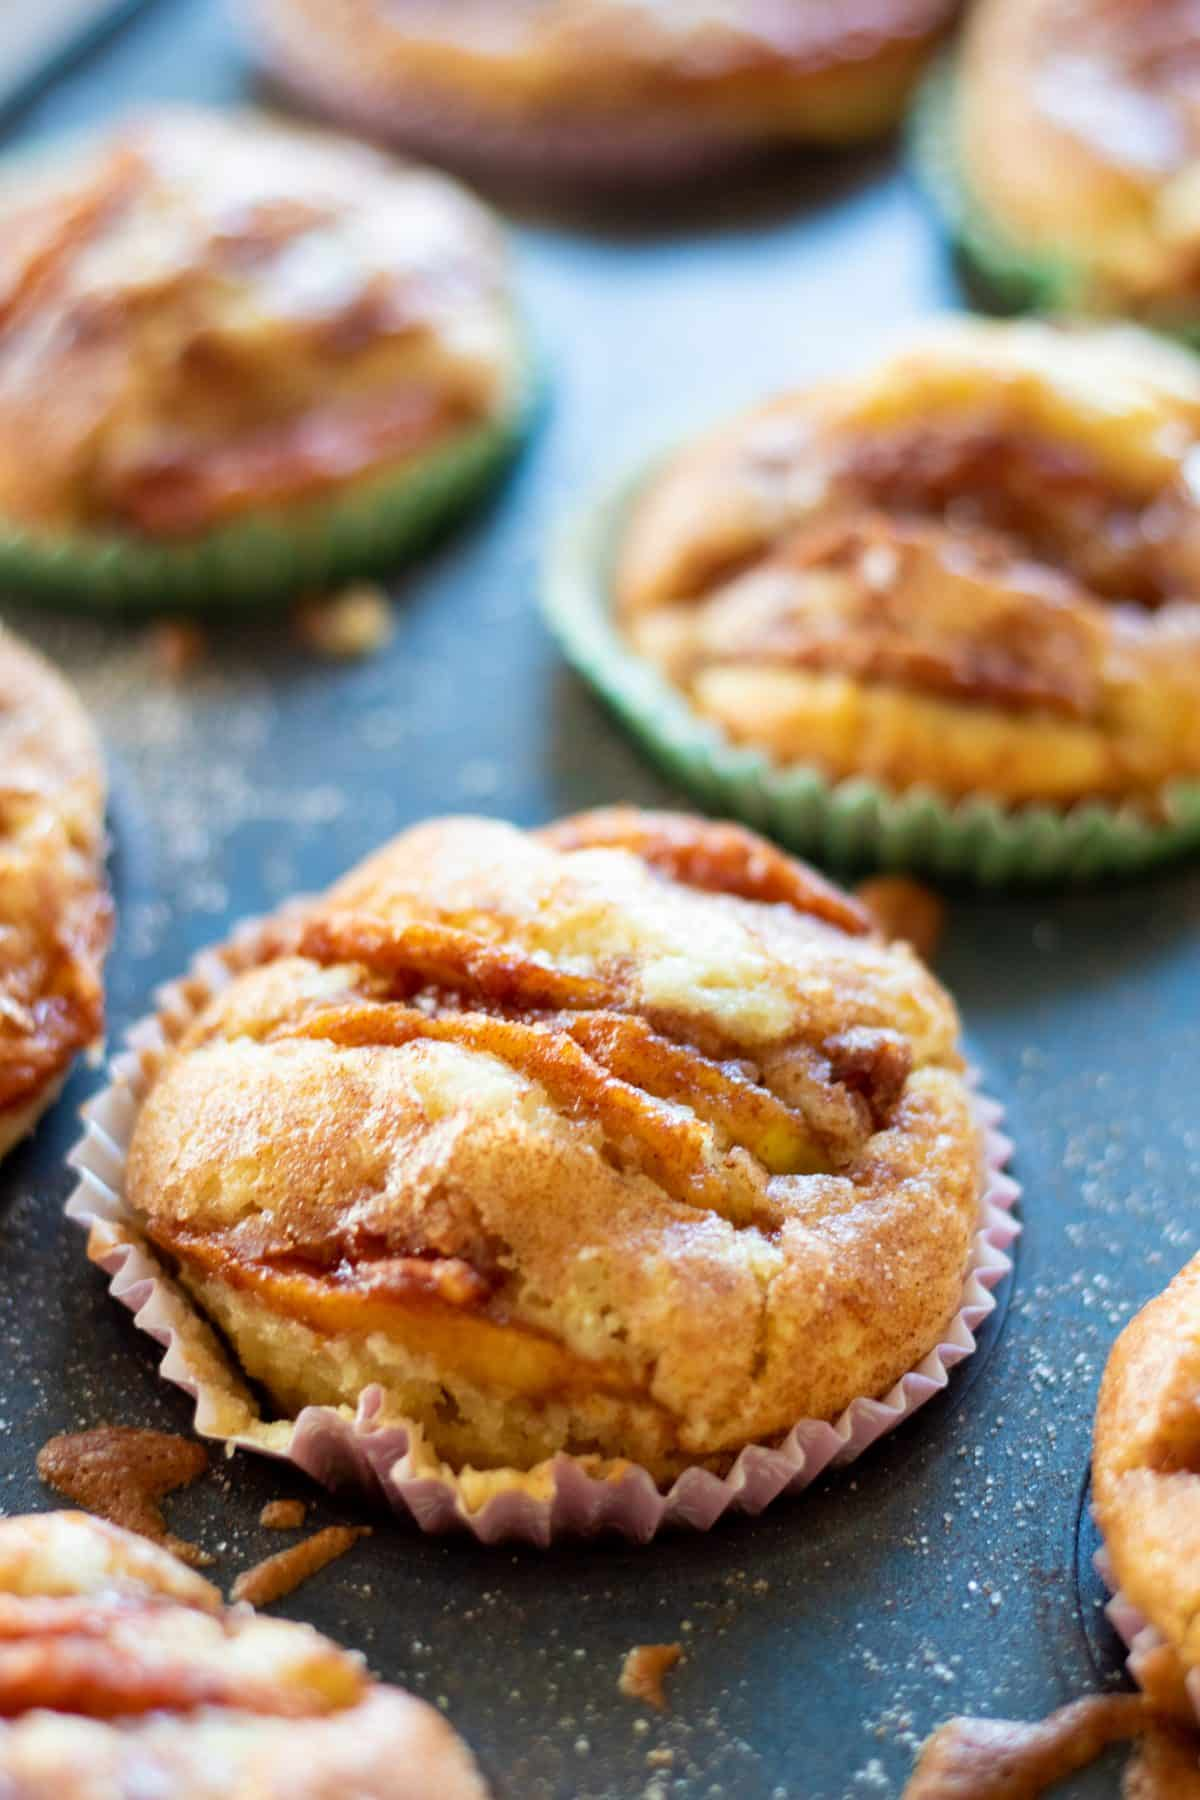 closeup of an apple cinnamon muffin